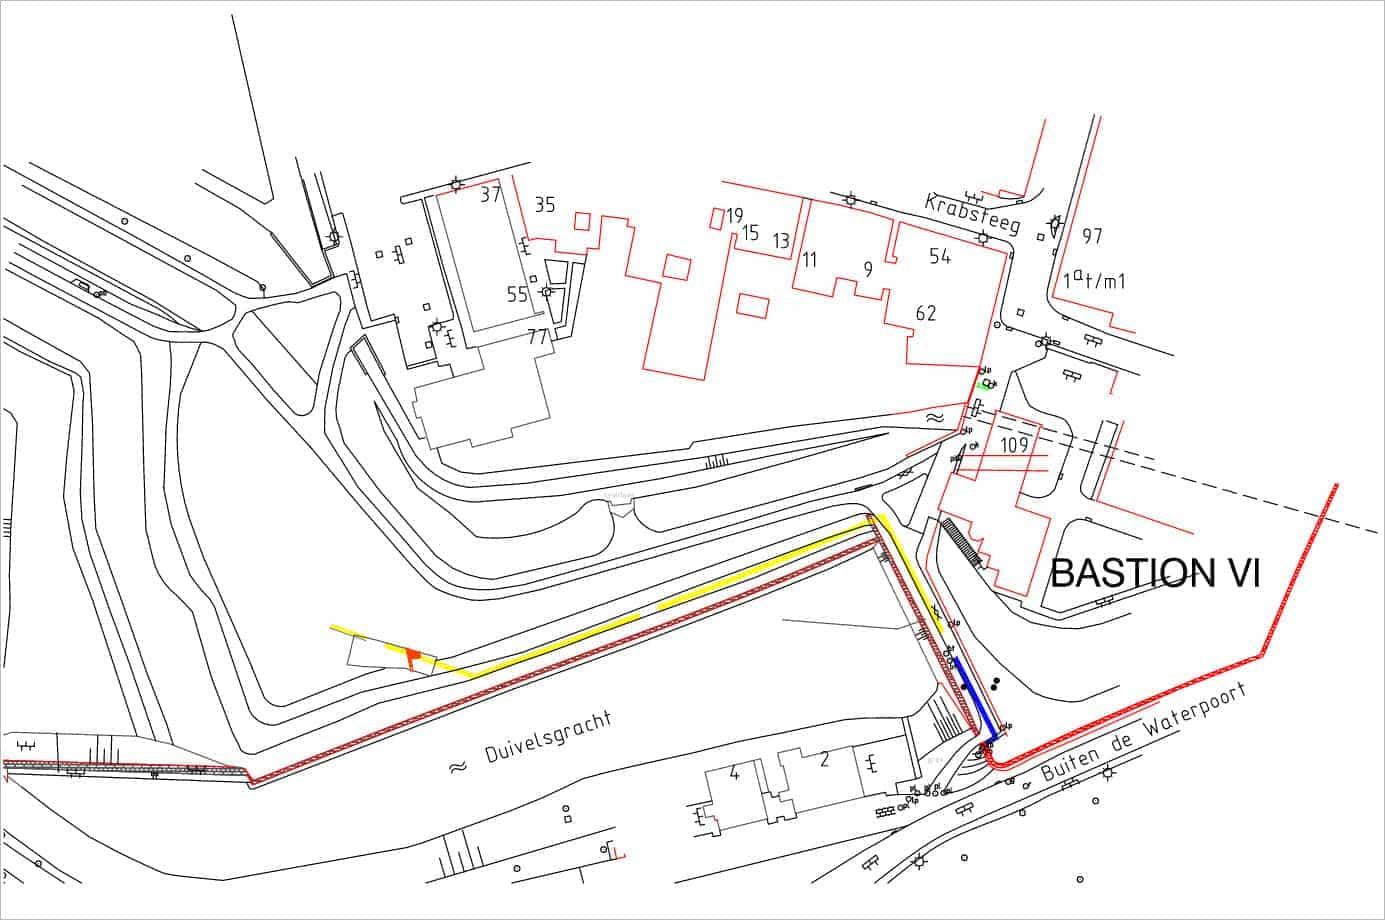 Bastions V en VI met de geplande damwand (geel) en de proefsleuf (oranje vlagje)